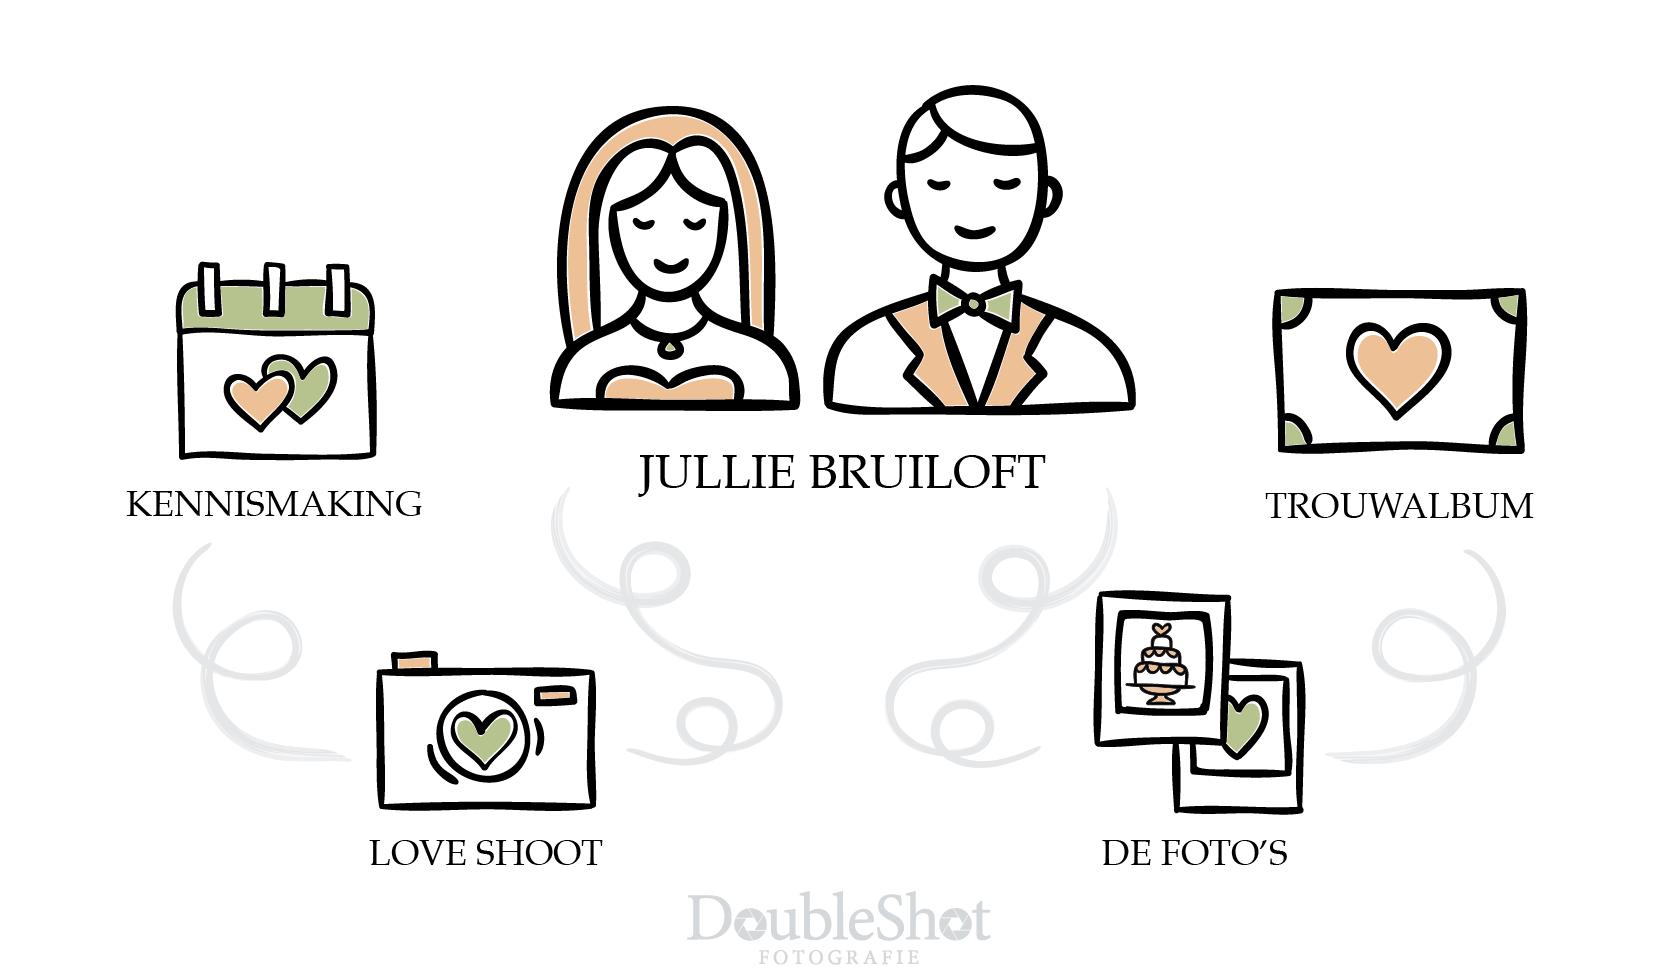 Doubleshot info